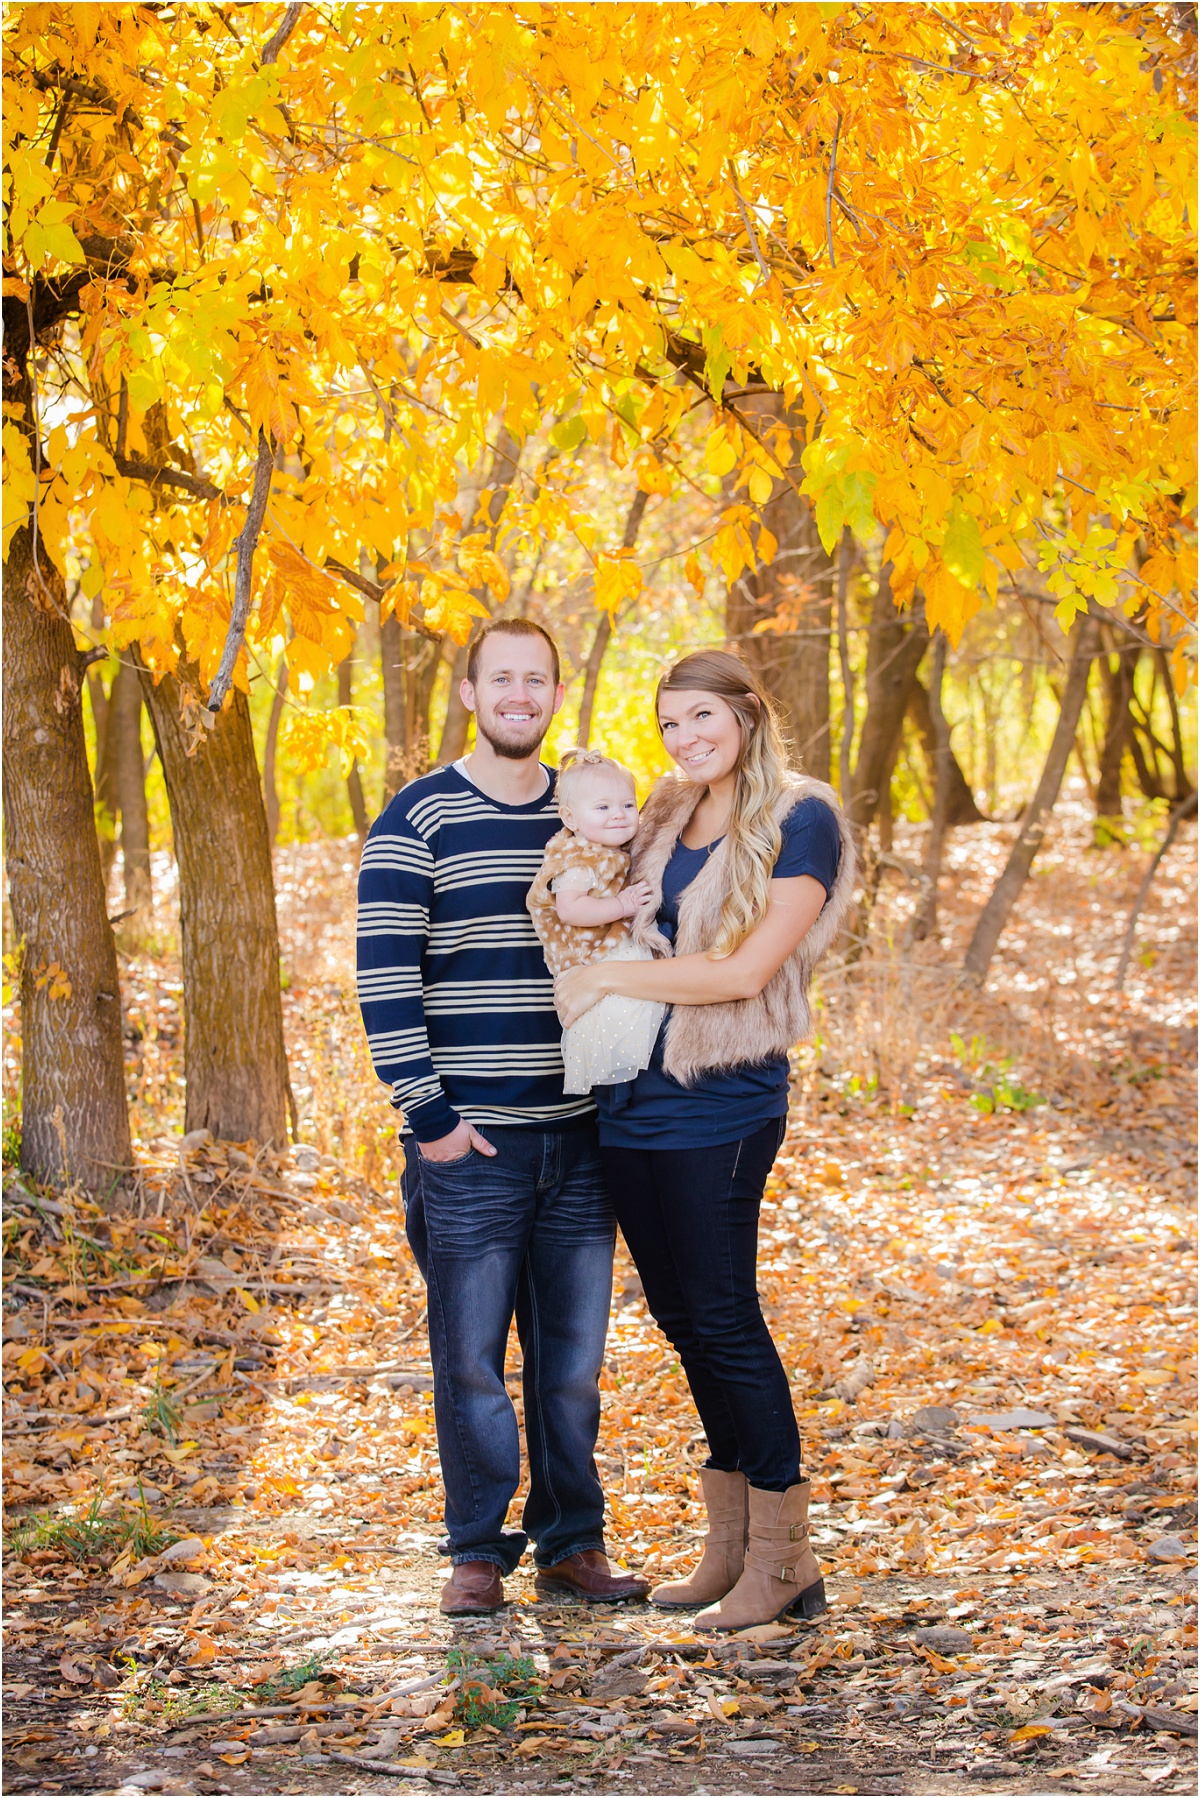 Terra Cooper Photography Utah Family Photography_5080.jpg